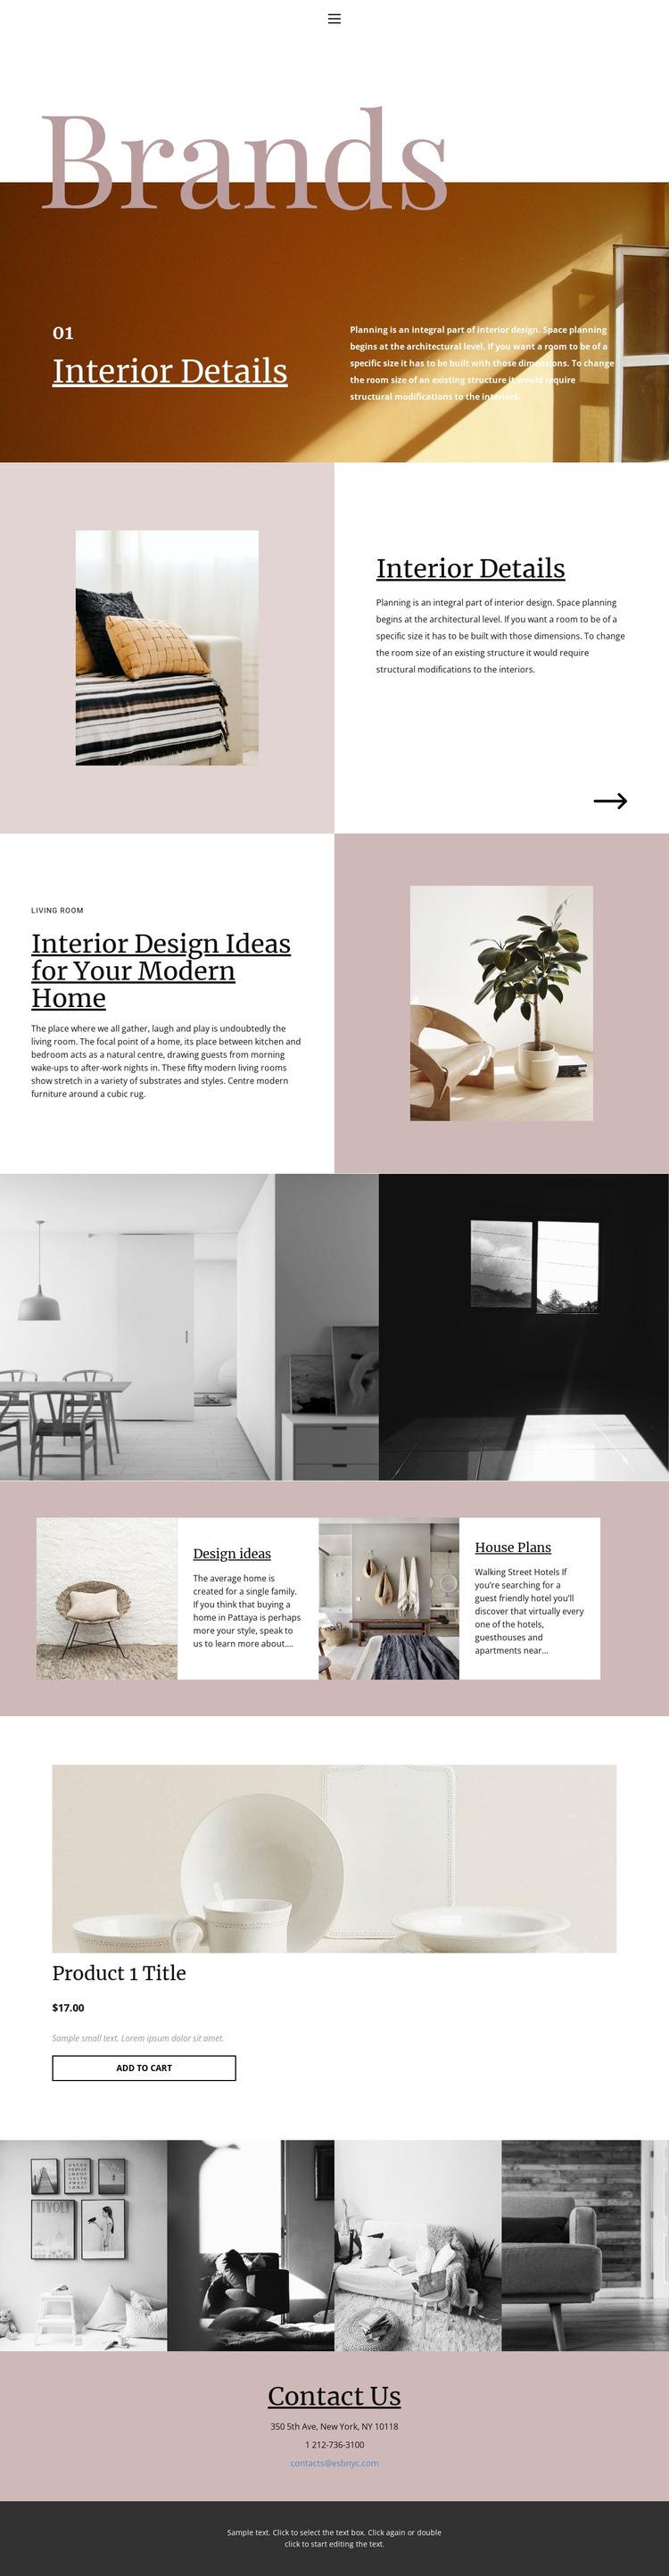 I am an interior designer HTML5 Template